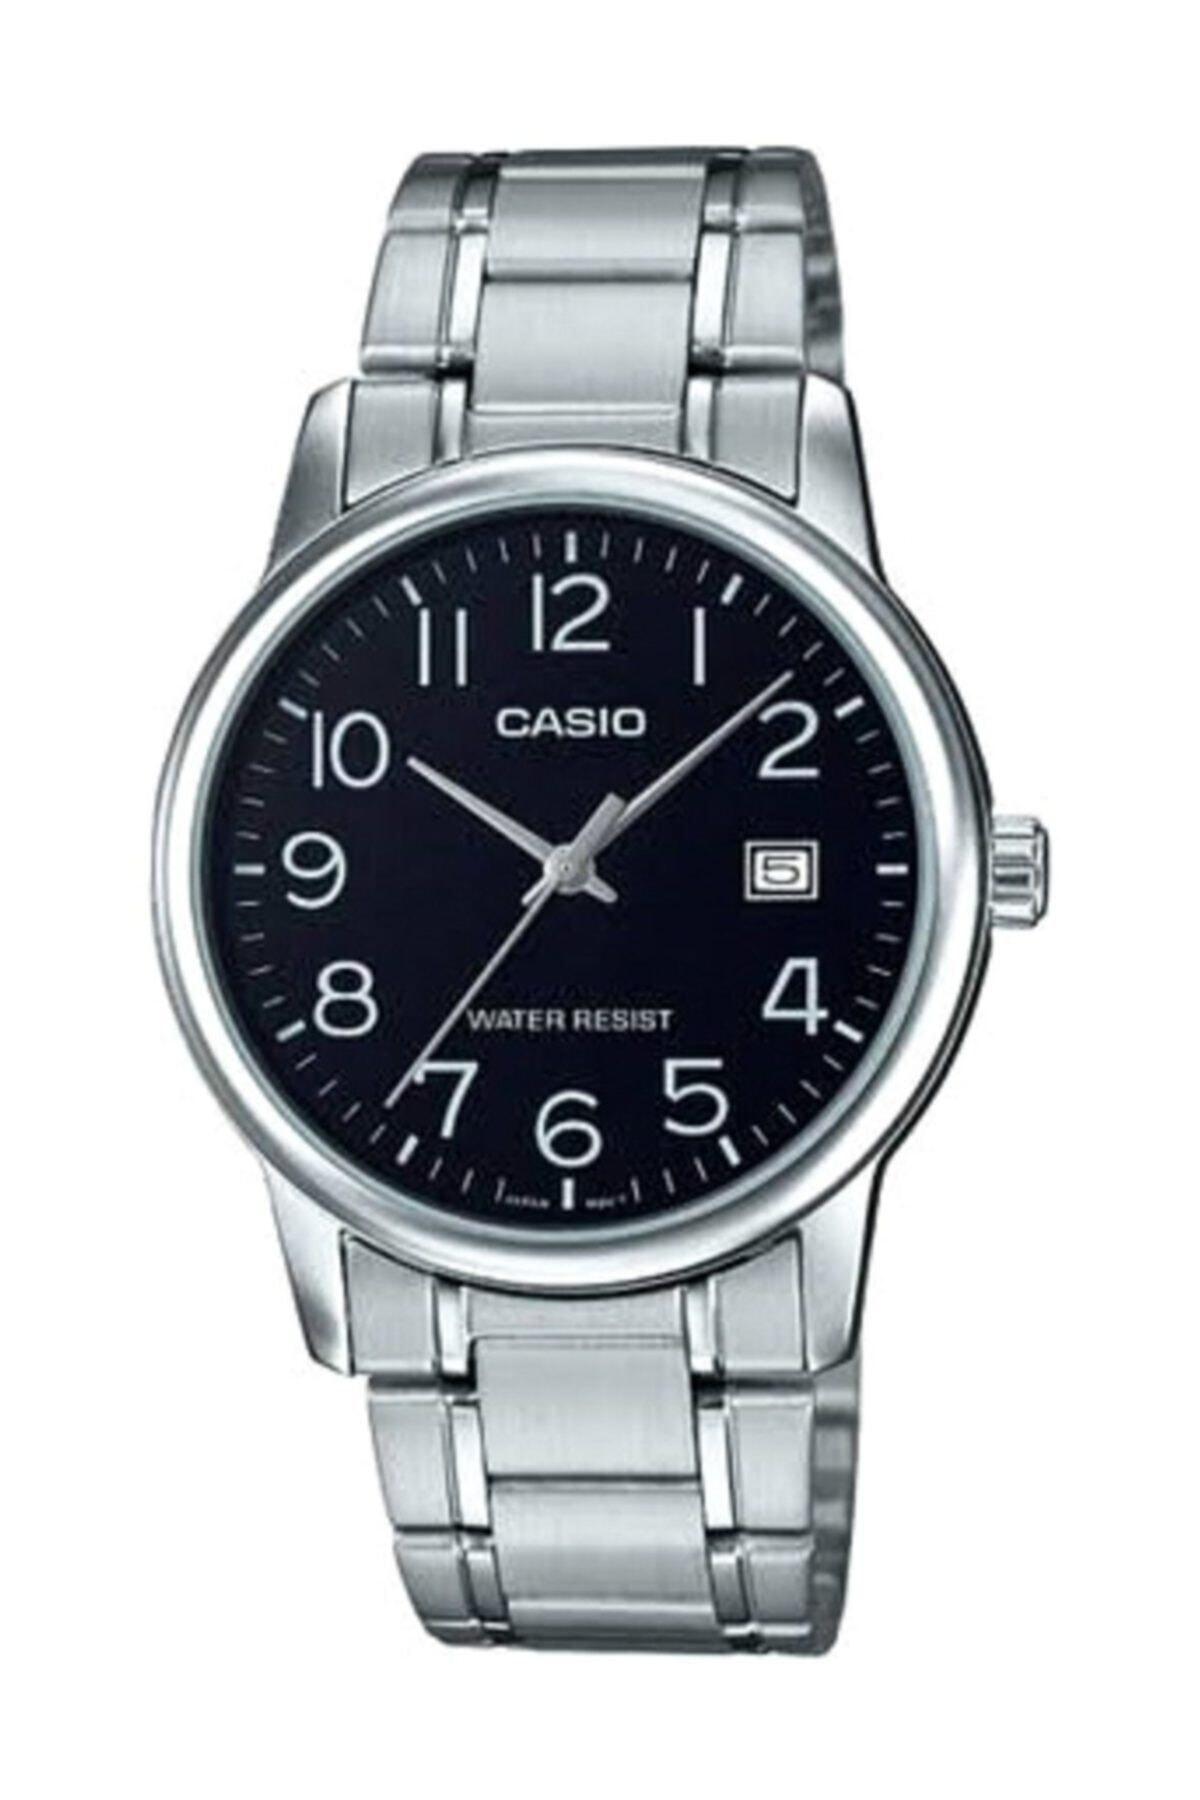 Casio Mtp-v002d-1budf Erkek Kol Saati 1